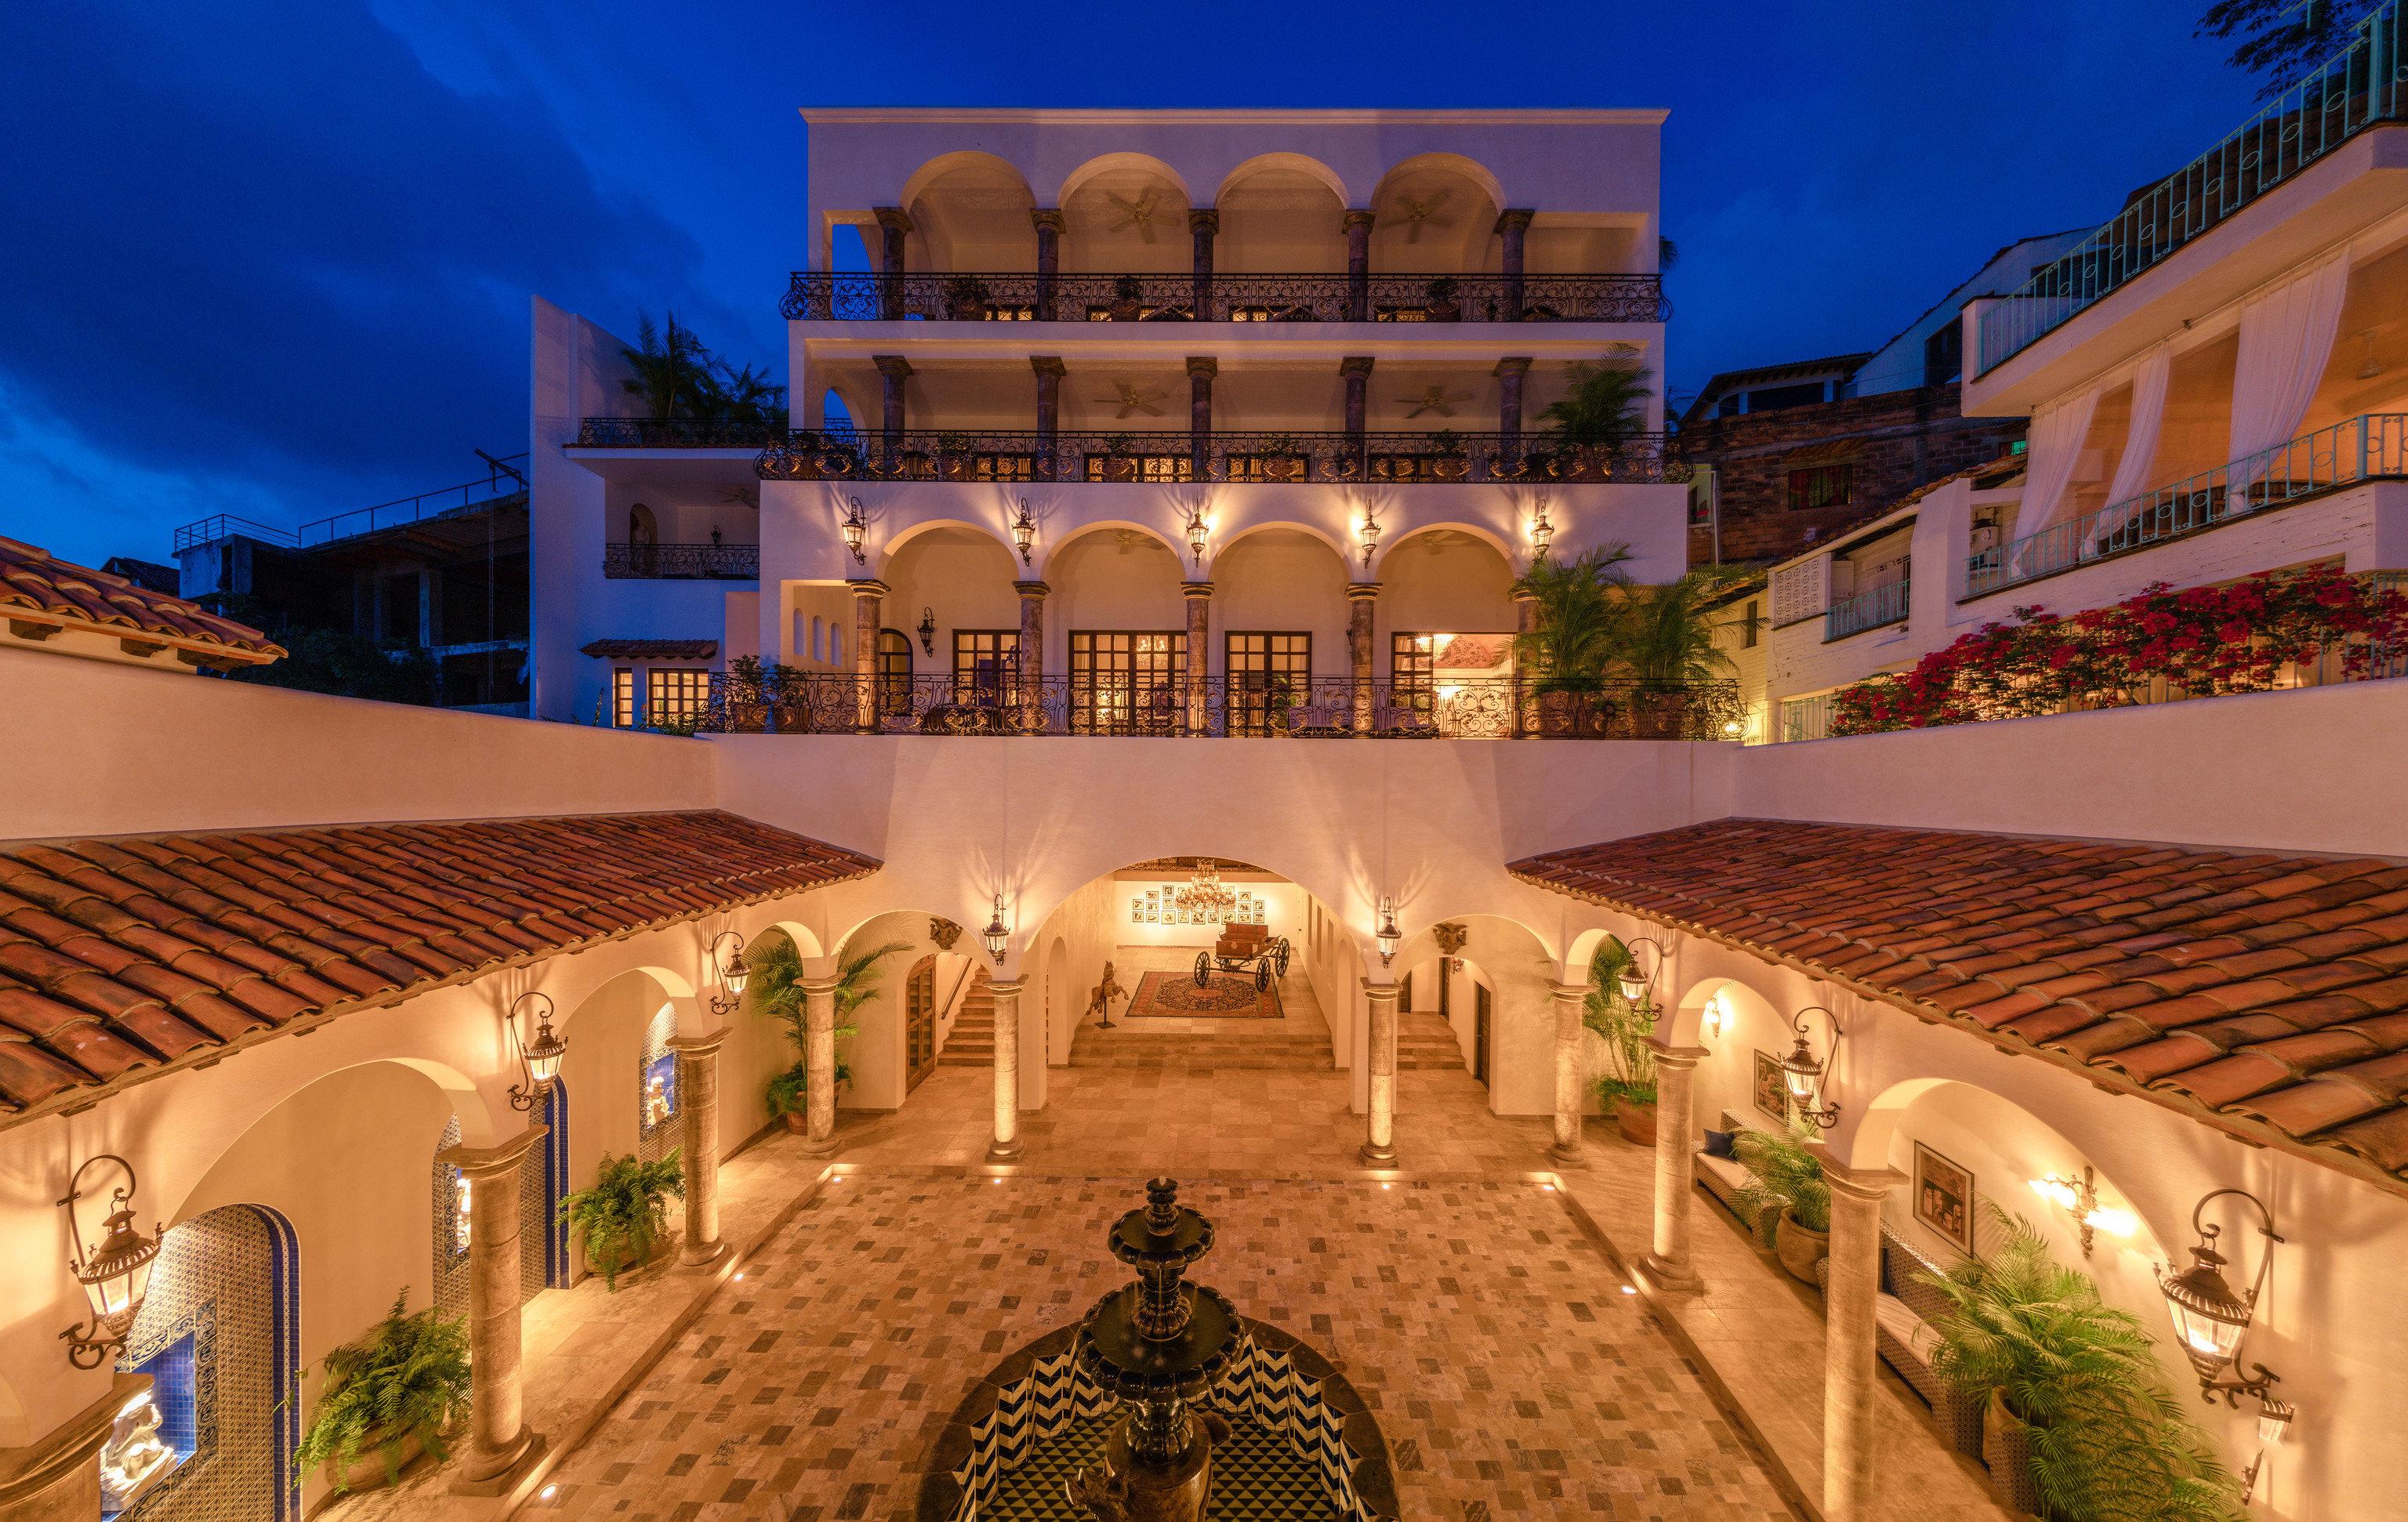 Hotels Romance building outdoor Resort estate palace plaza hacienda mansion screenshot several